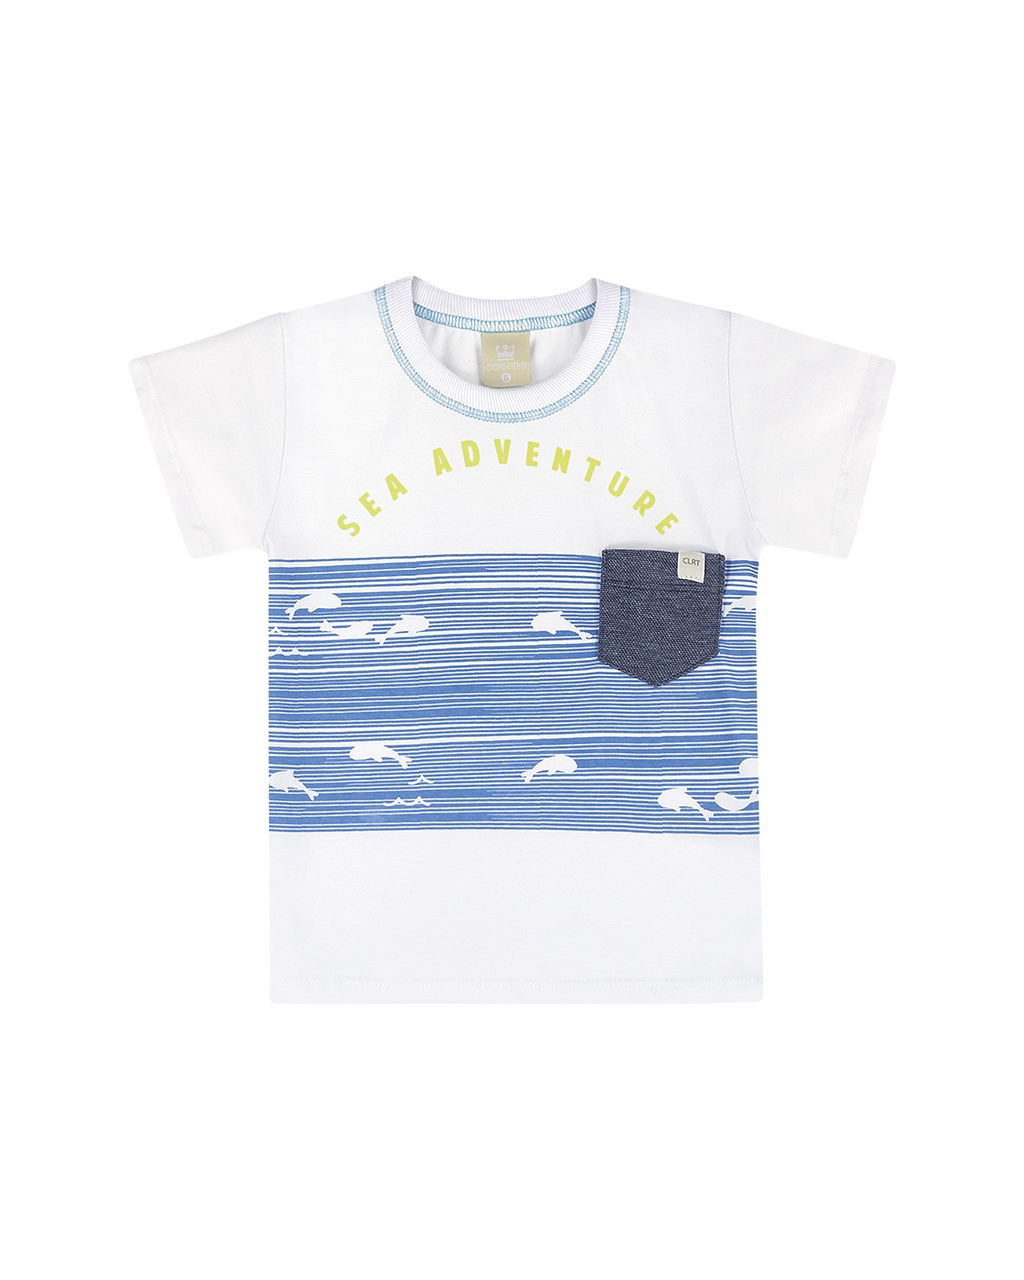 Camiseta Masculina Infantil Off White Peixinho Colorittá